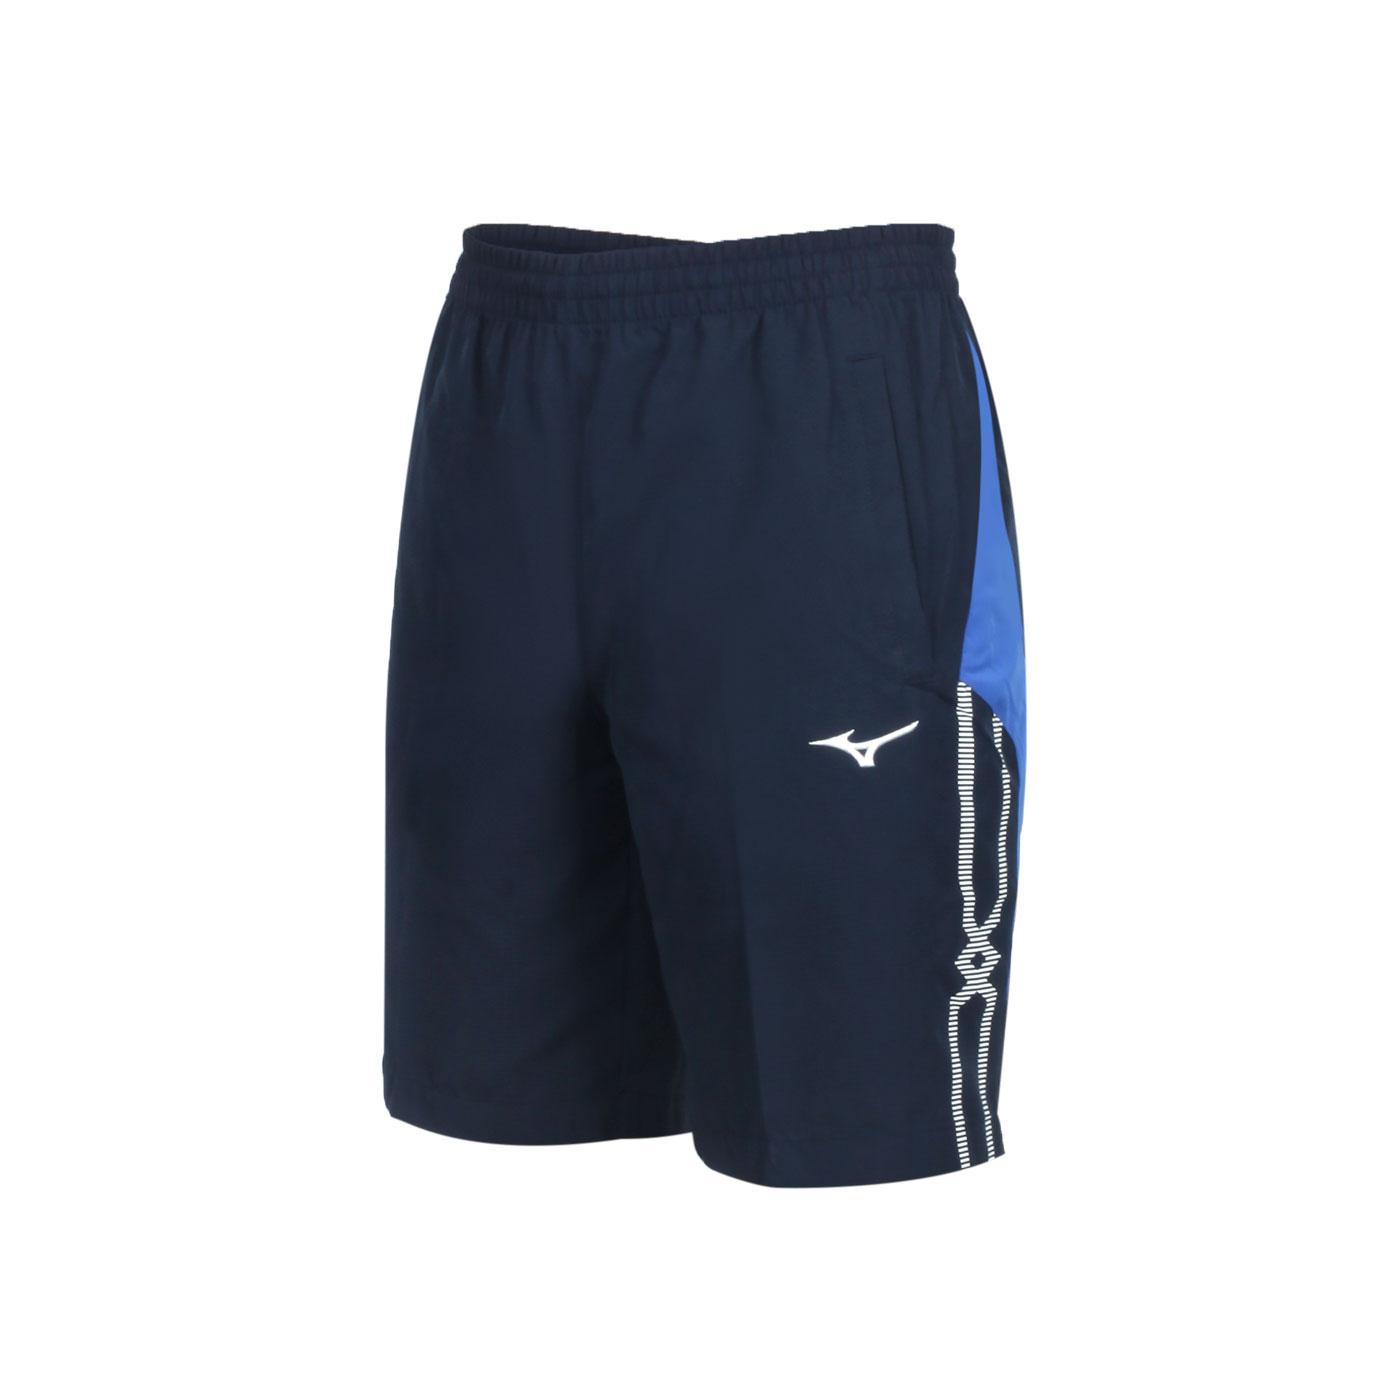 MIZUNO 男款平織運動短褲 32TB055314 - 丈青藍白